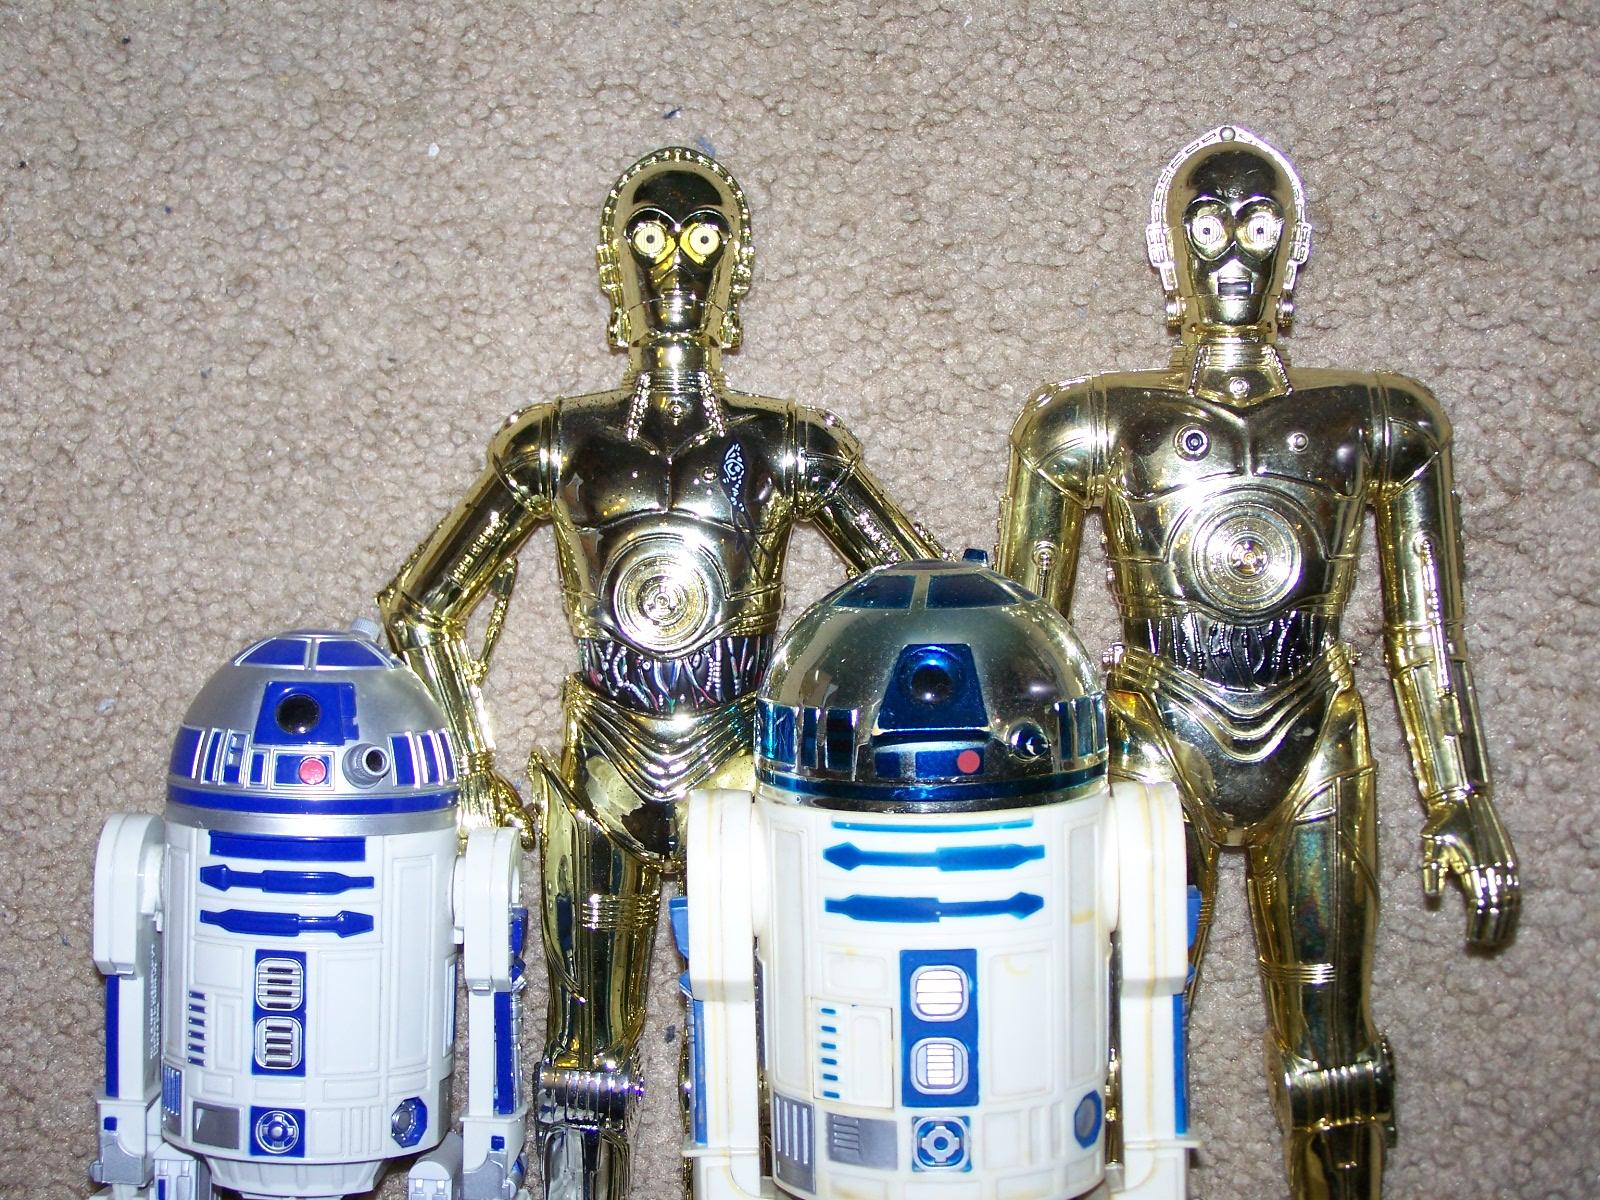 R2d2 And C3po Toys : R d and c po kenner vs hasbro